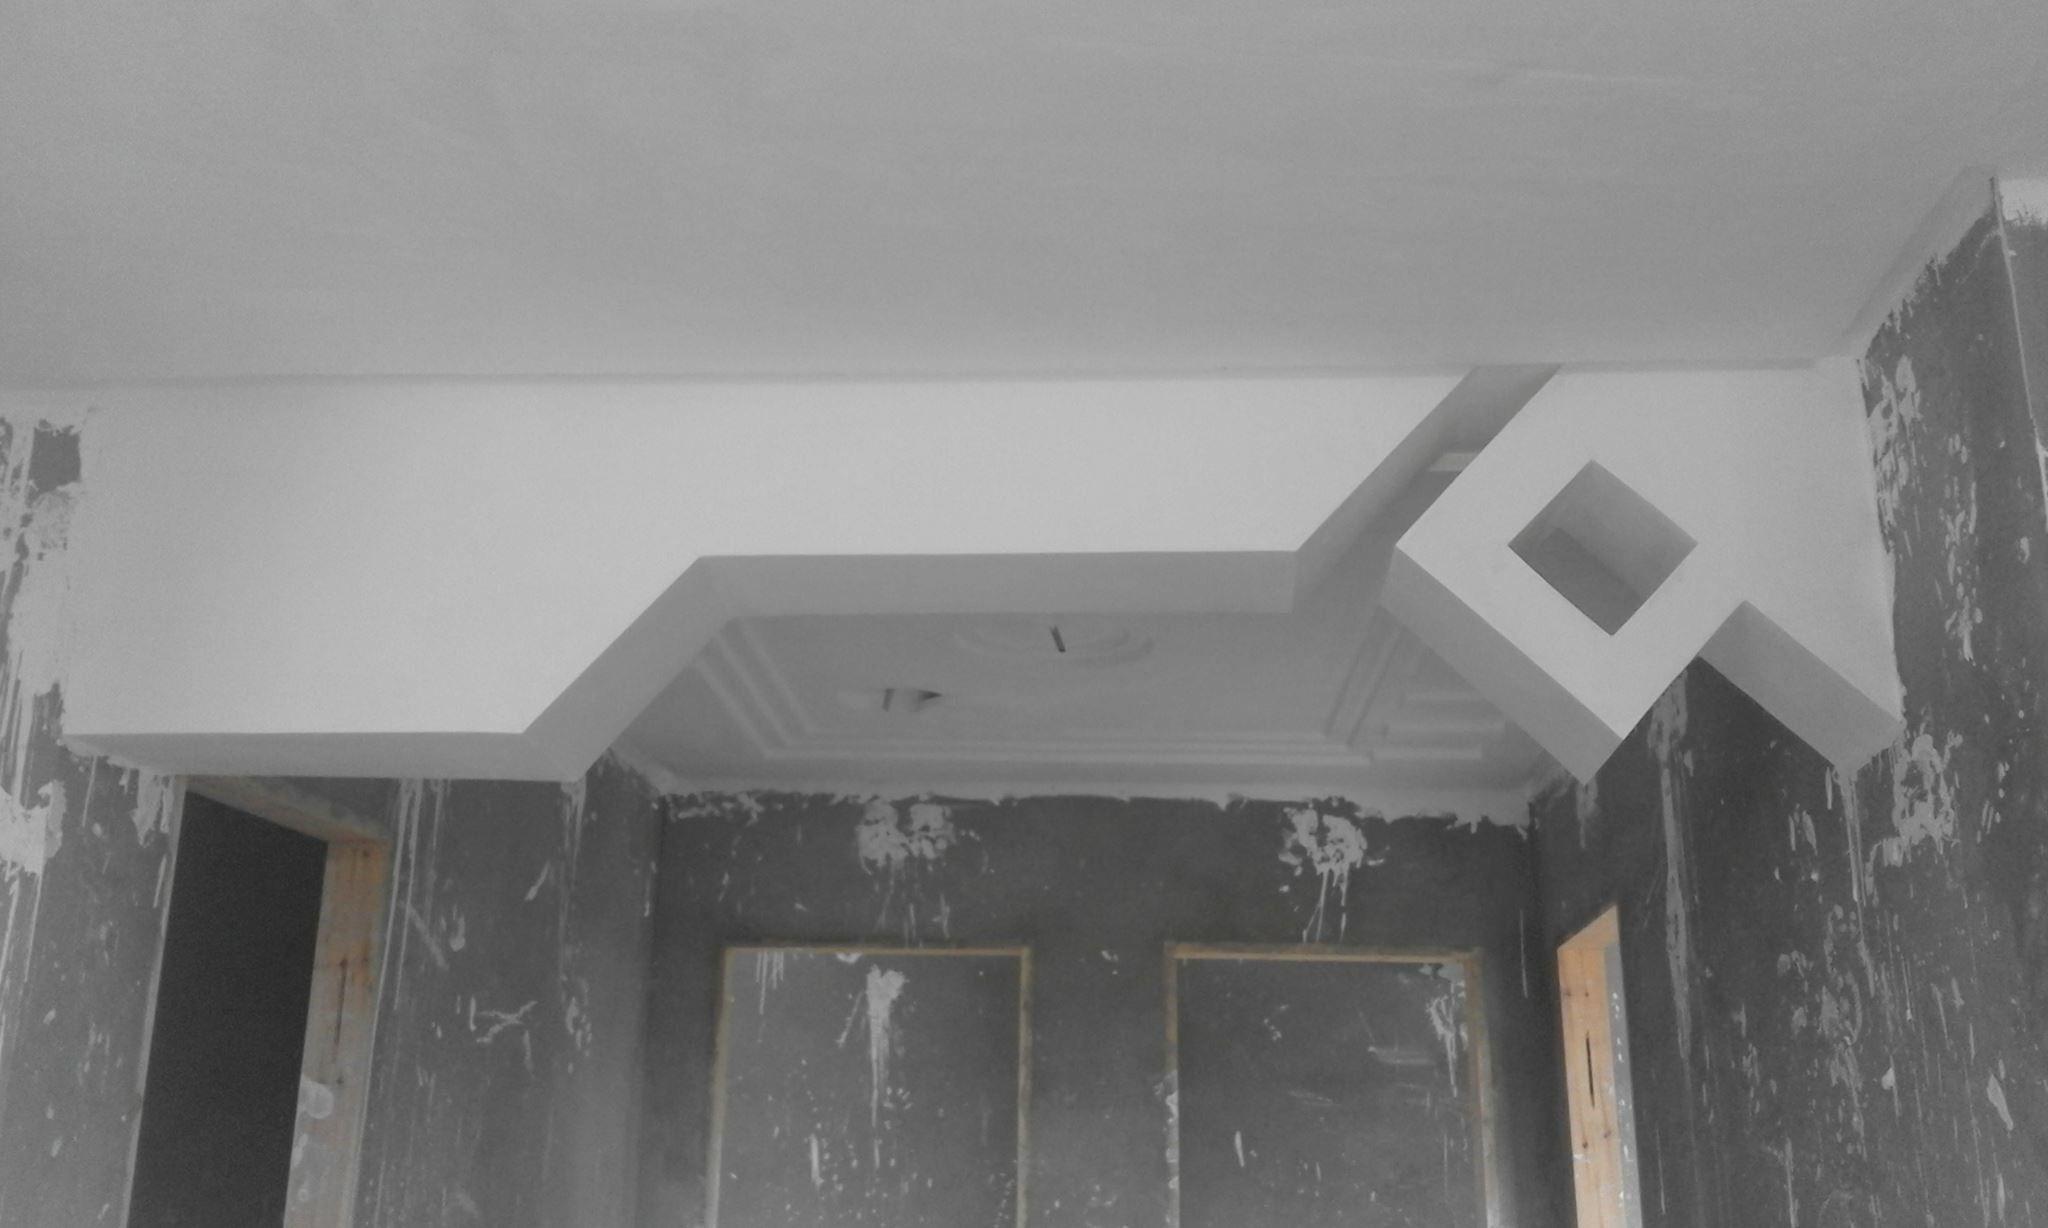 Pin by نبيل لديكور on جبس | Pop false ceiling design ...